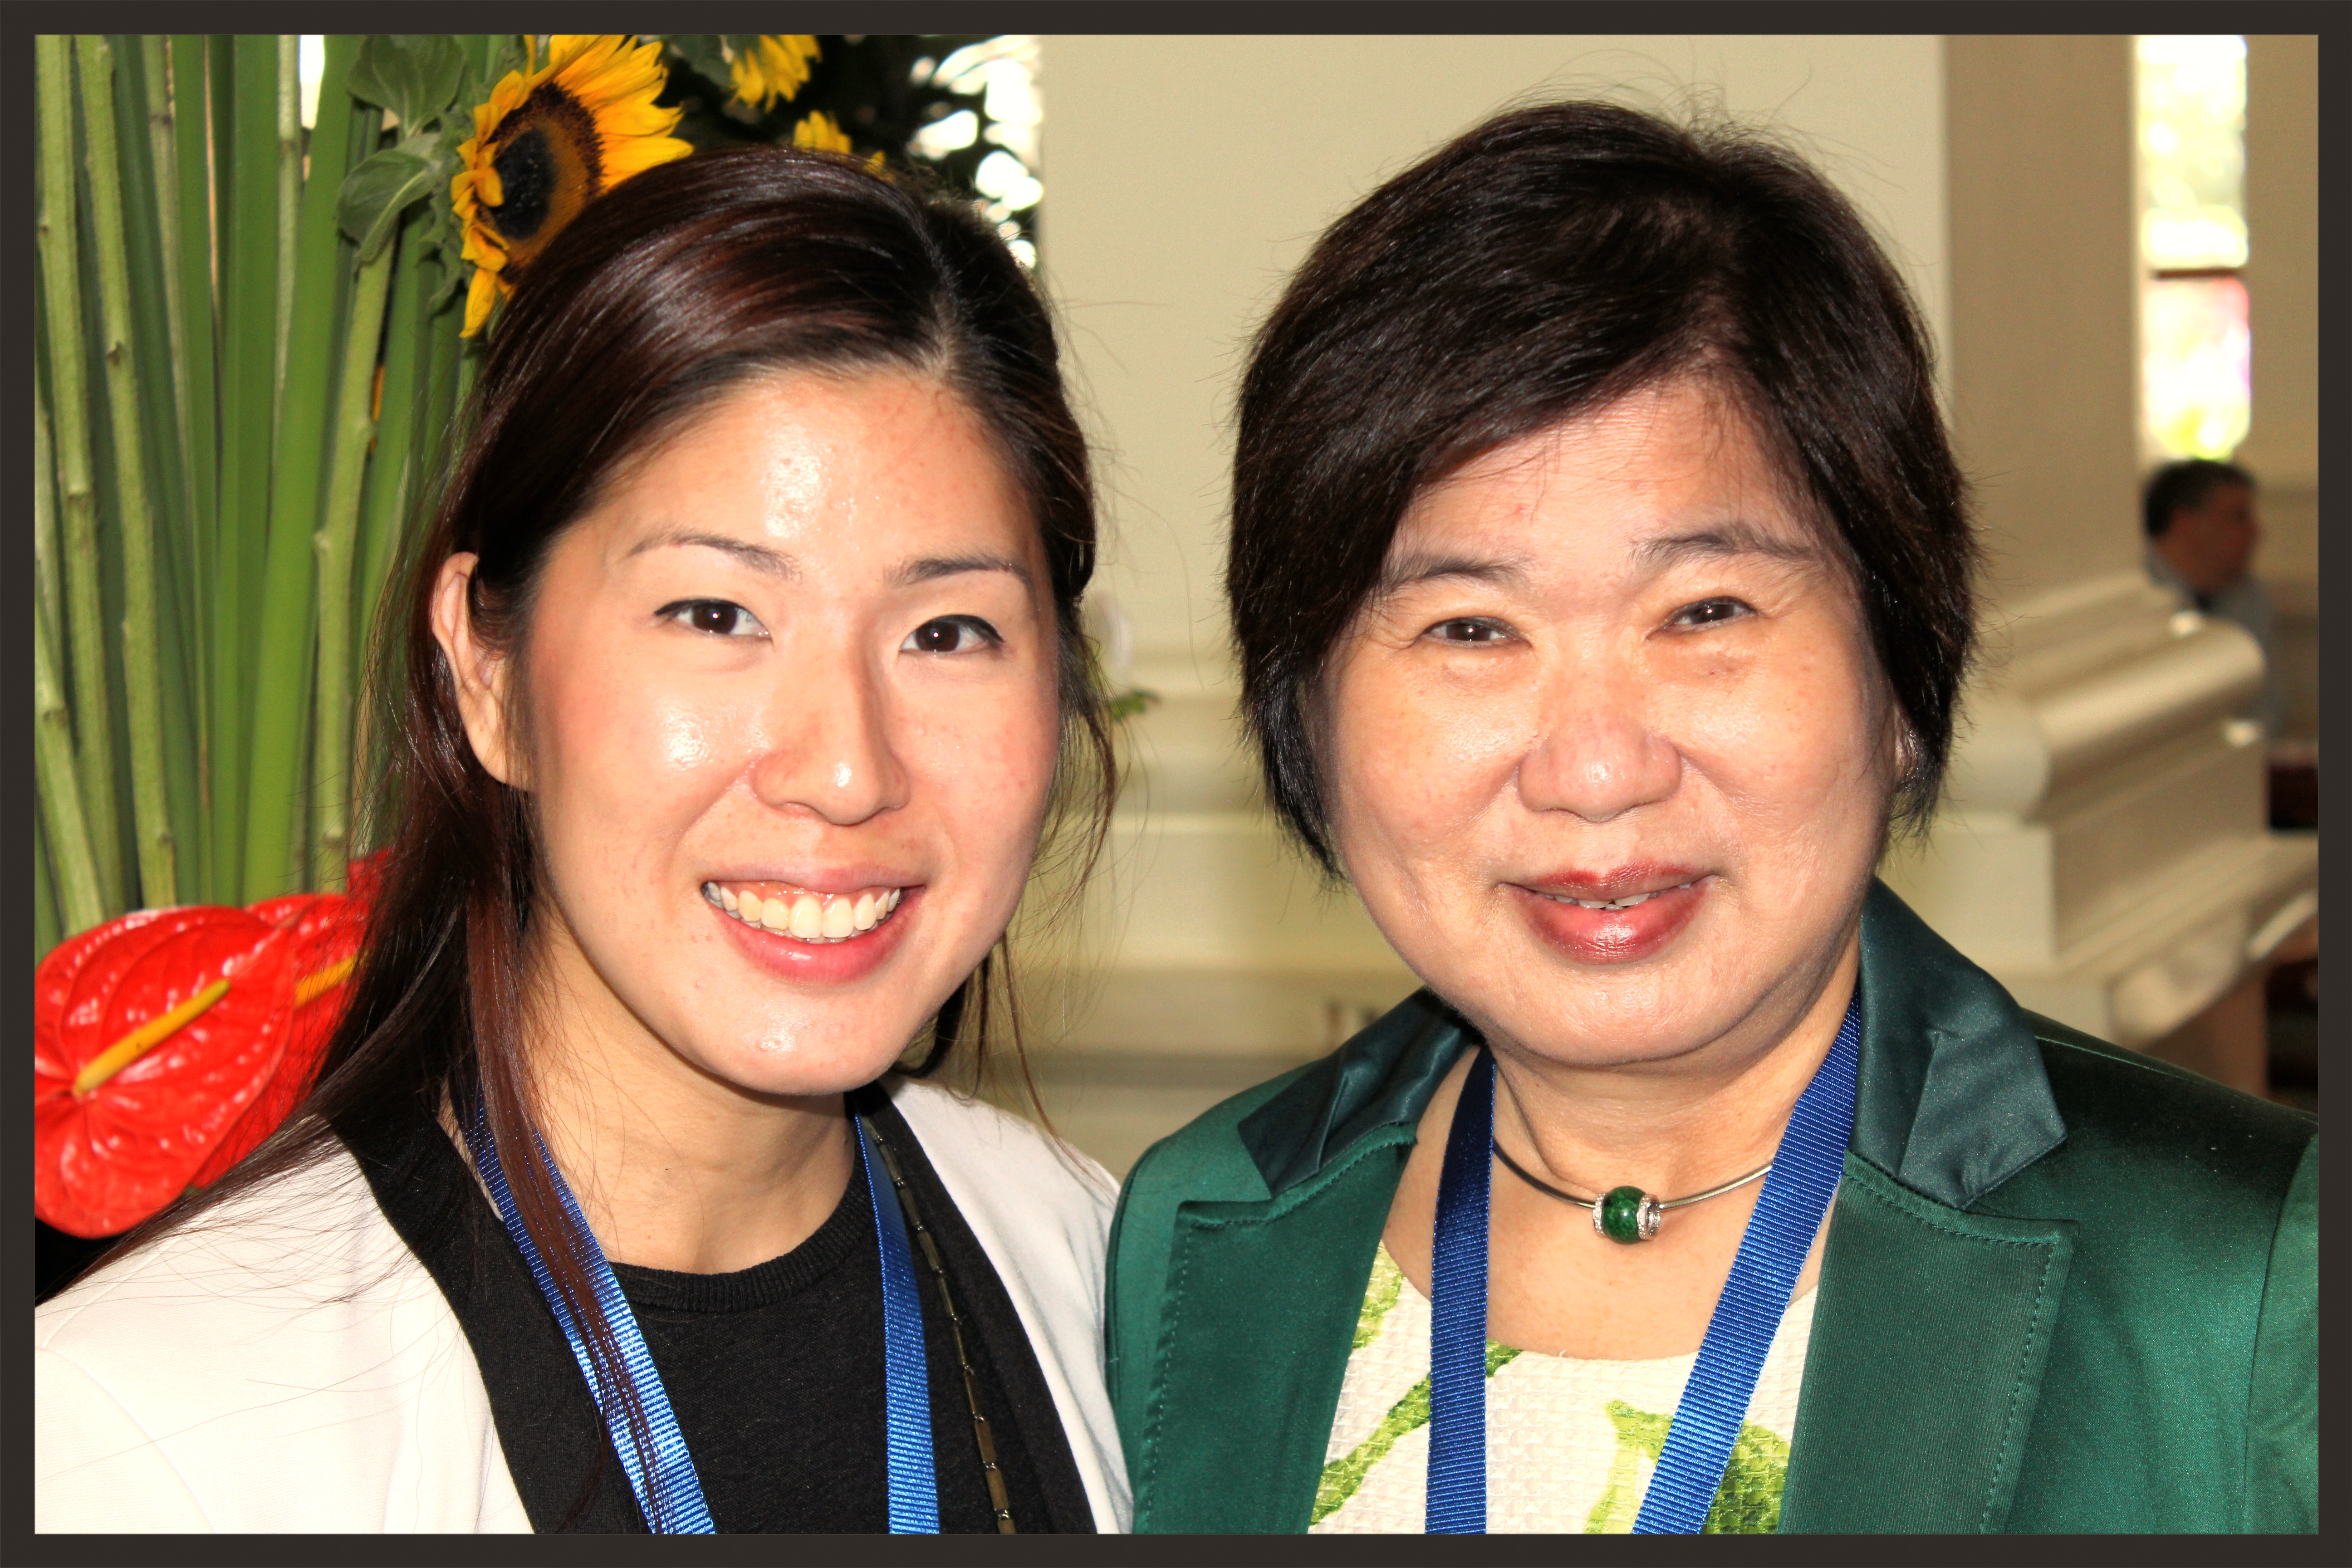 Jane_Lim_and_Lim_De_Min_in_Singapore-286529-edited